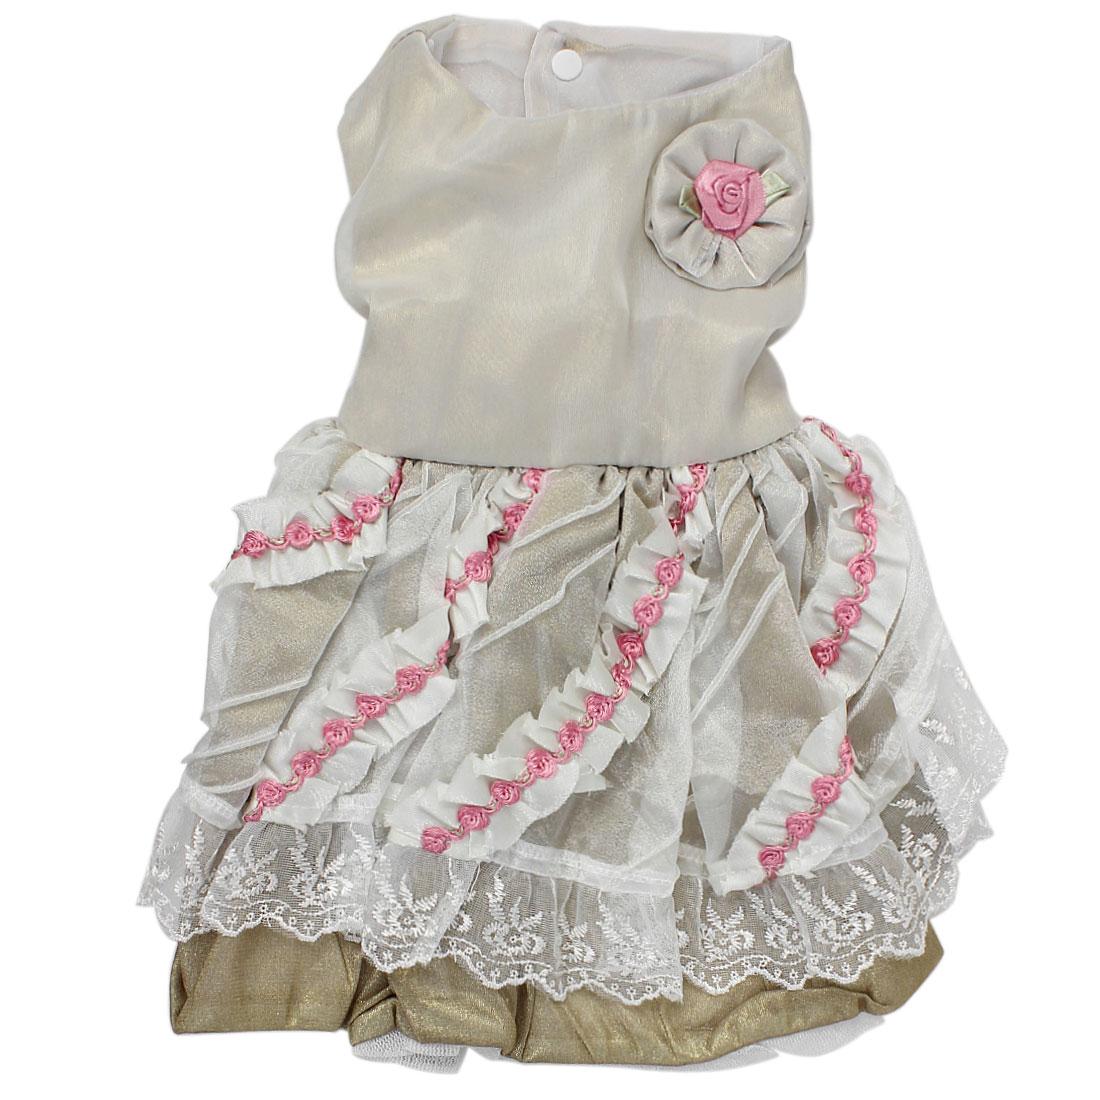 Pet Dog Puppy Rose Lace Decor Princess Wedding Dress Skirt Gold Tone Size L